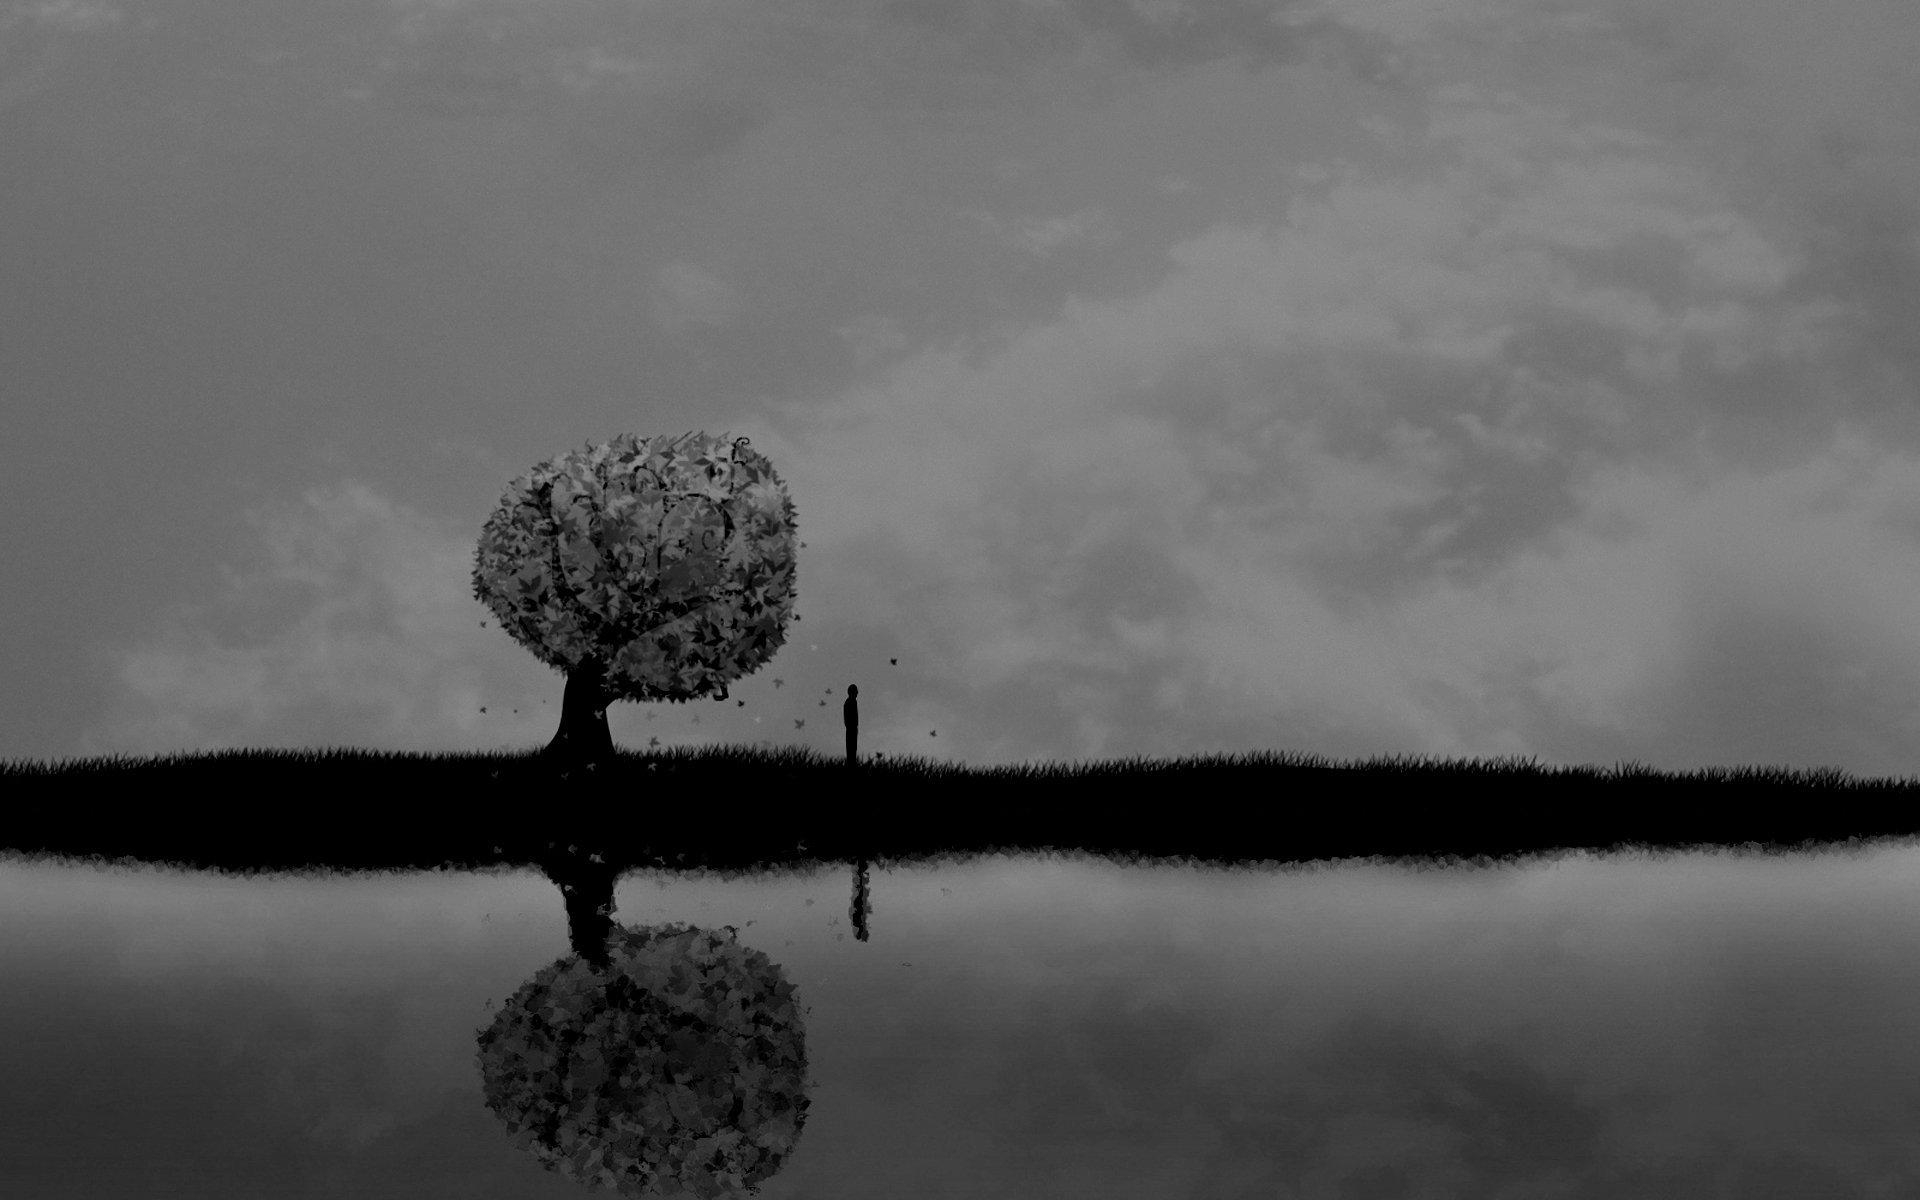 dark sadness wallpaper background - photo #18